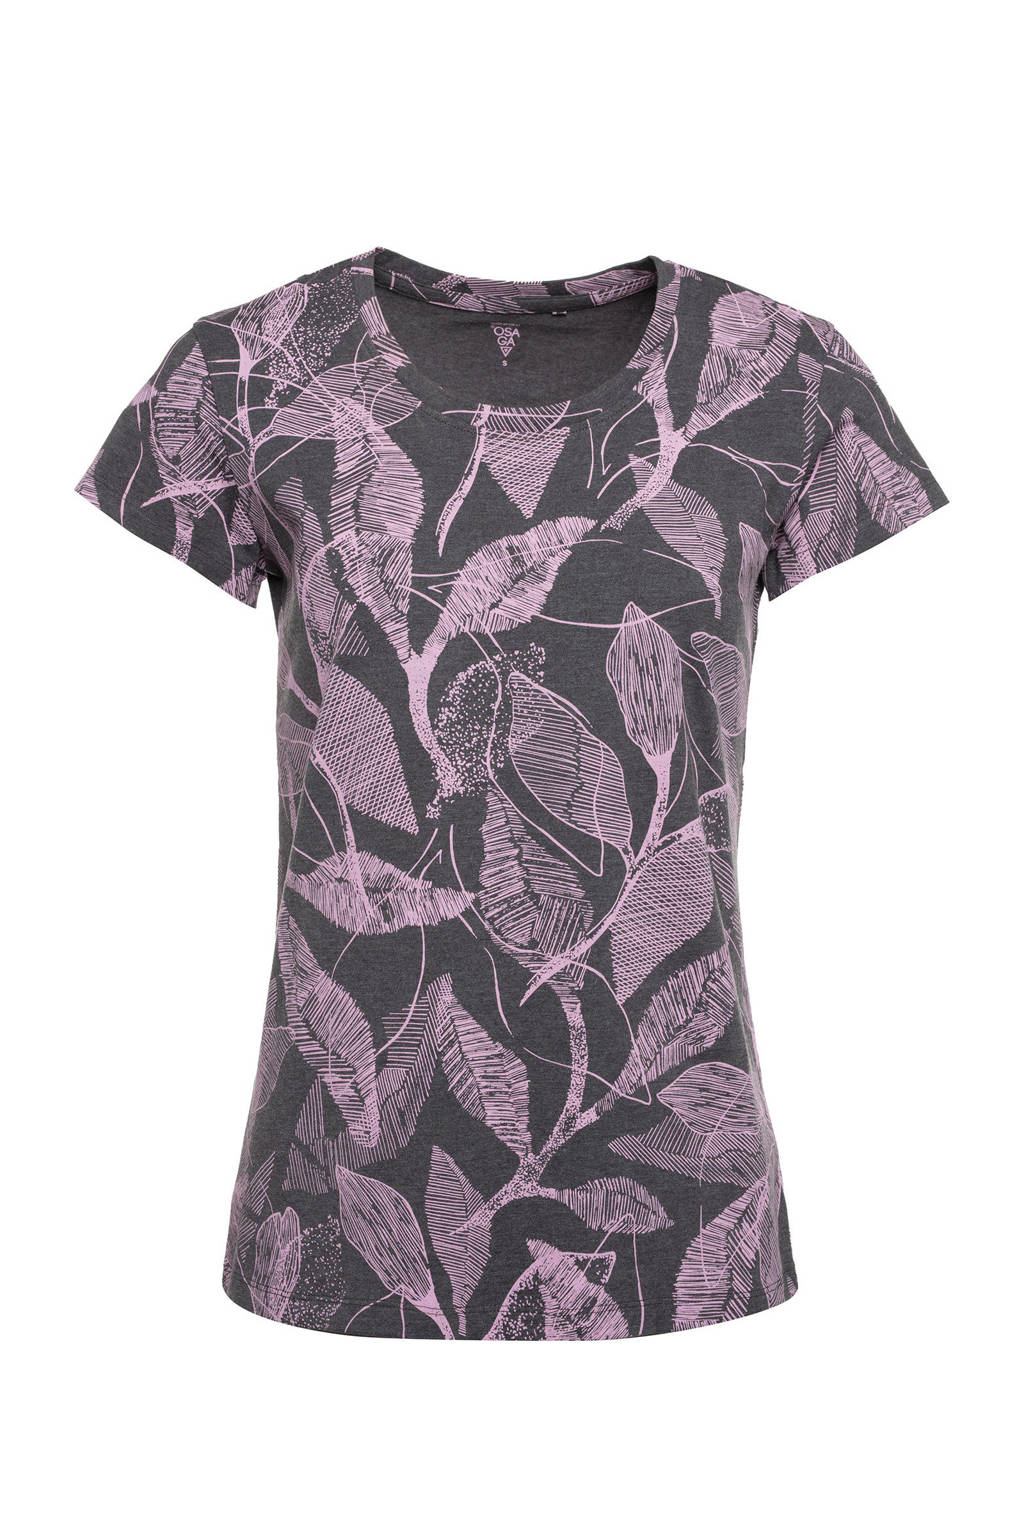 Scapino Osaga sport T-shirt donkergrijs/roze, Donkergrijs/roze